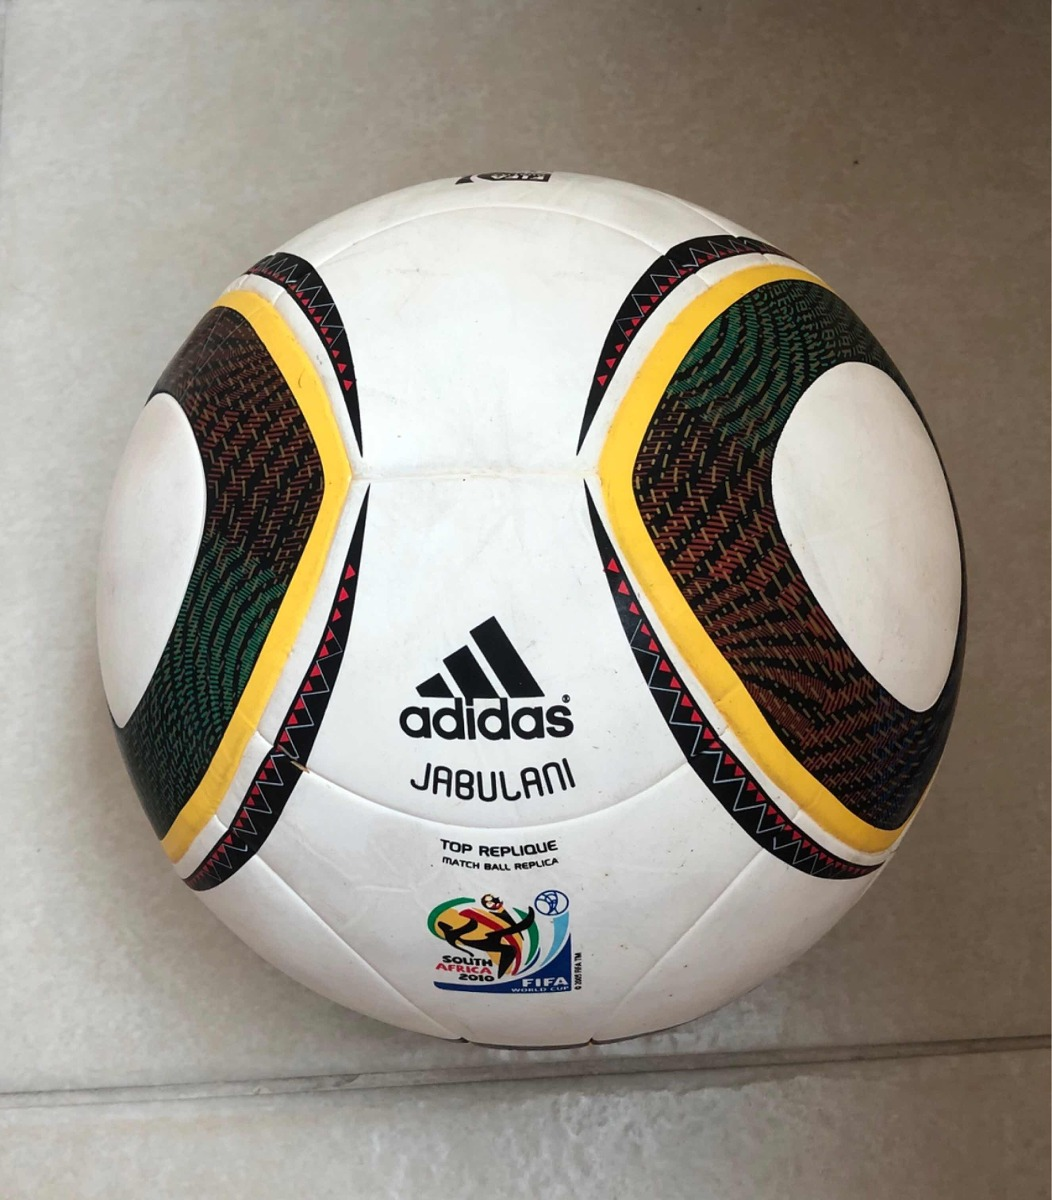 c93a8d3c61ce2 bola de futebol jabulani fifa copa 2010 - replica oficial. Carregando zoom.